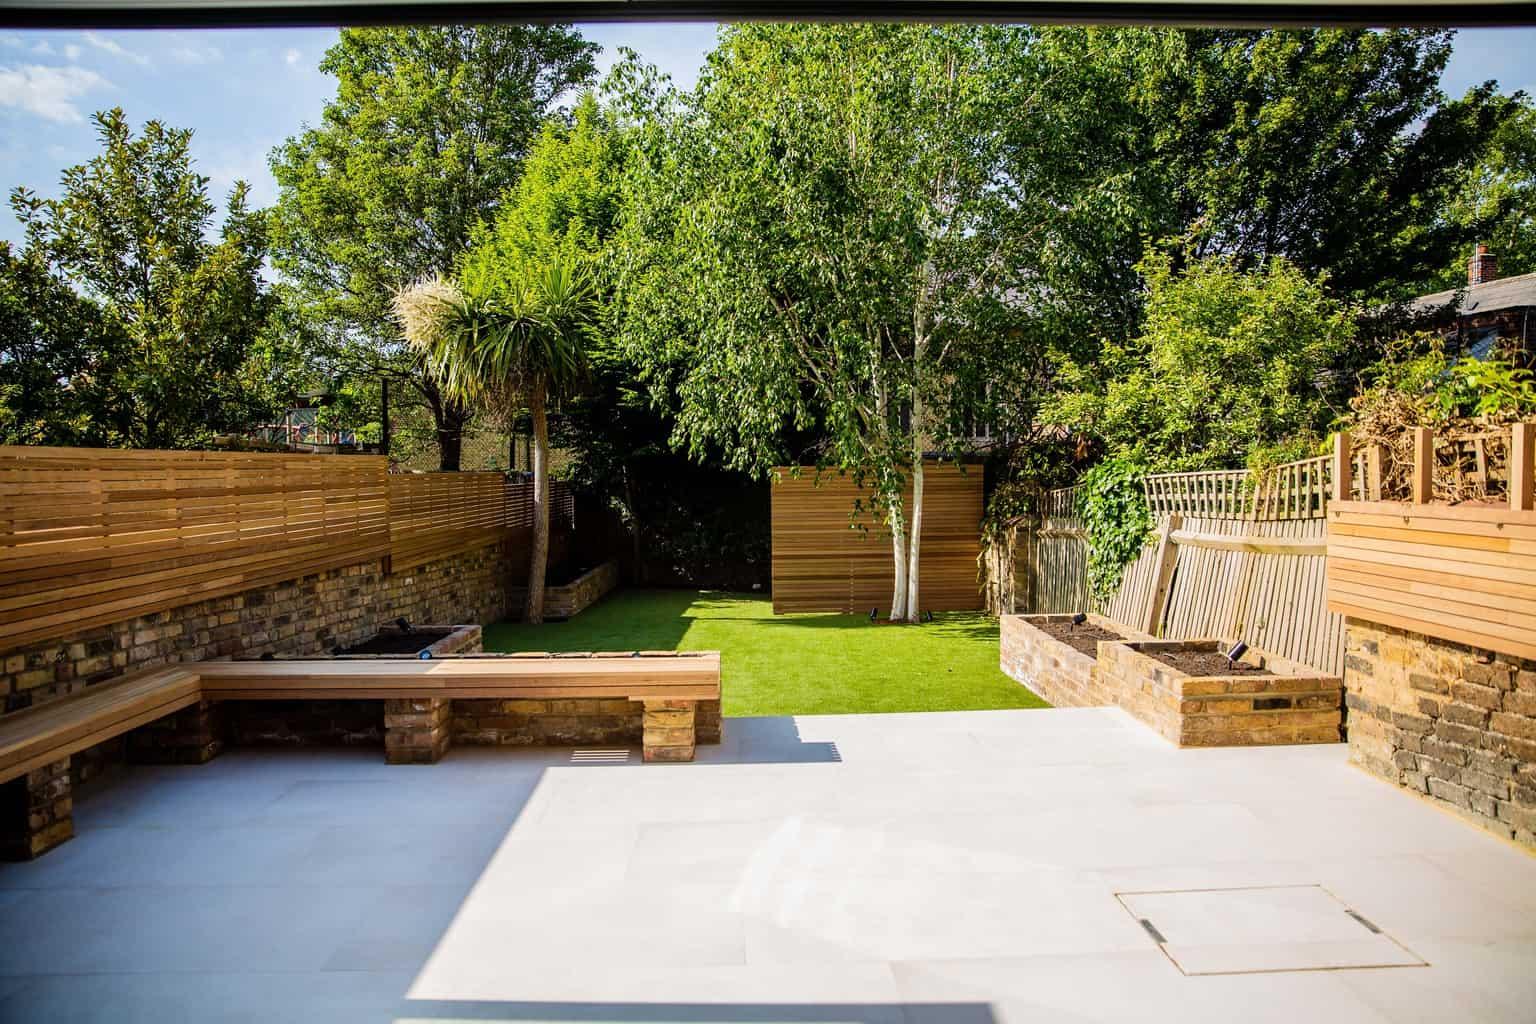 house garden interior design, project management, house home refurbishment, renovation, extension, modernisation, balham, wandsworth